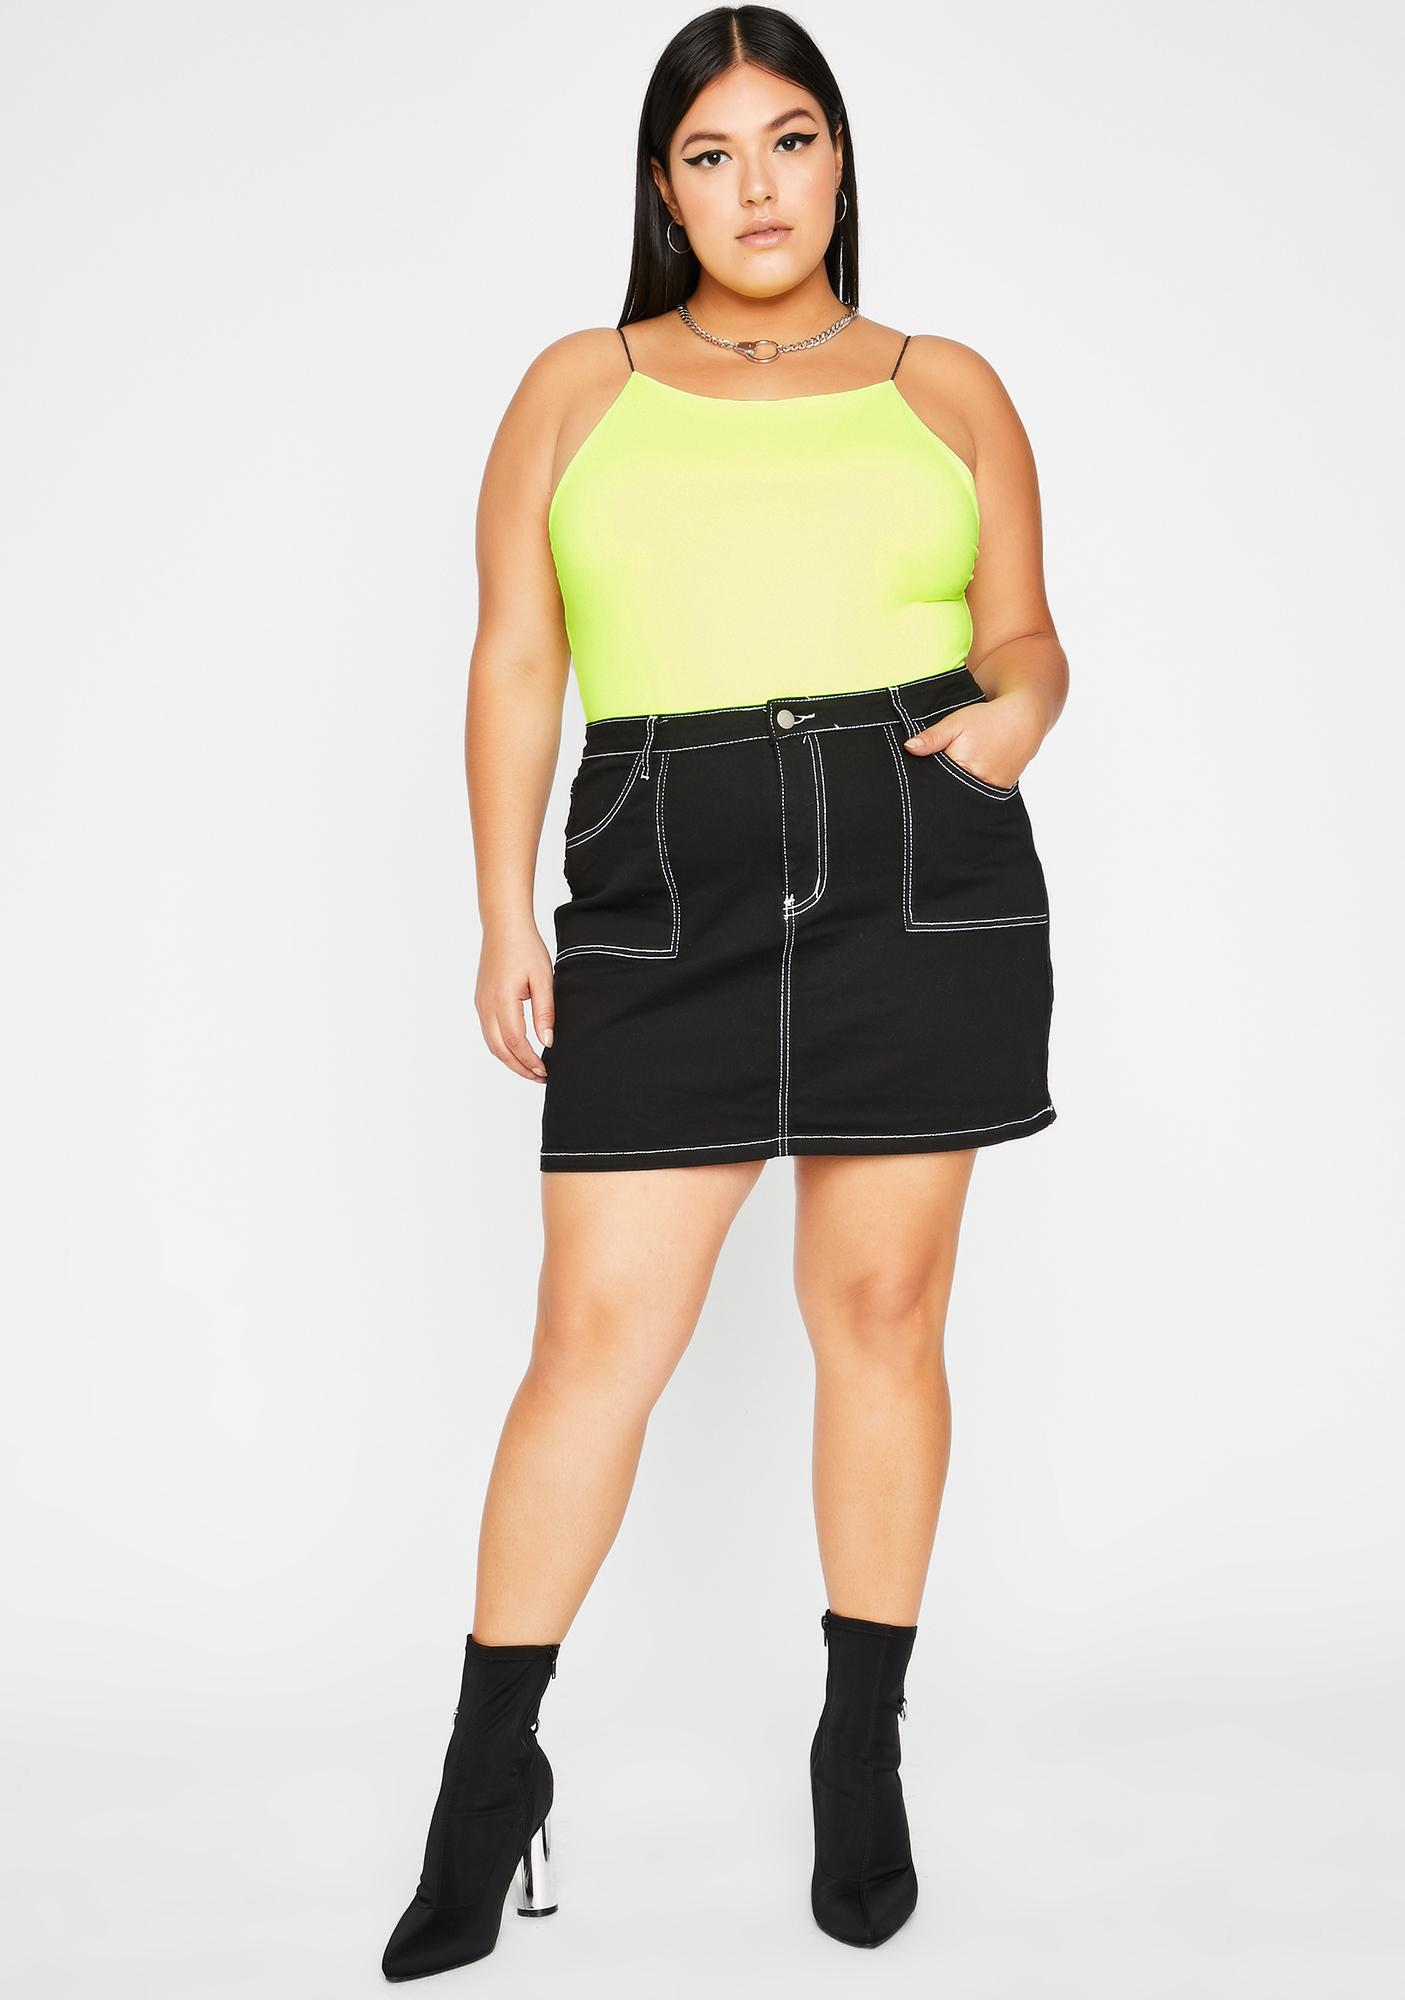 Totally Livin' Lit Cami Bodysuit